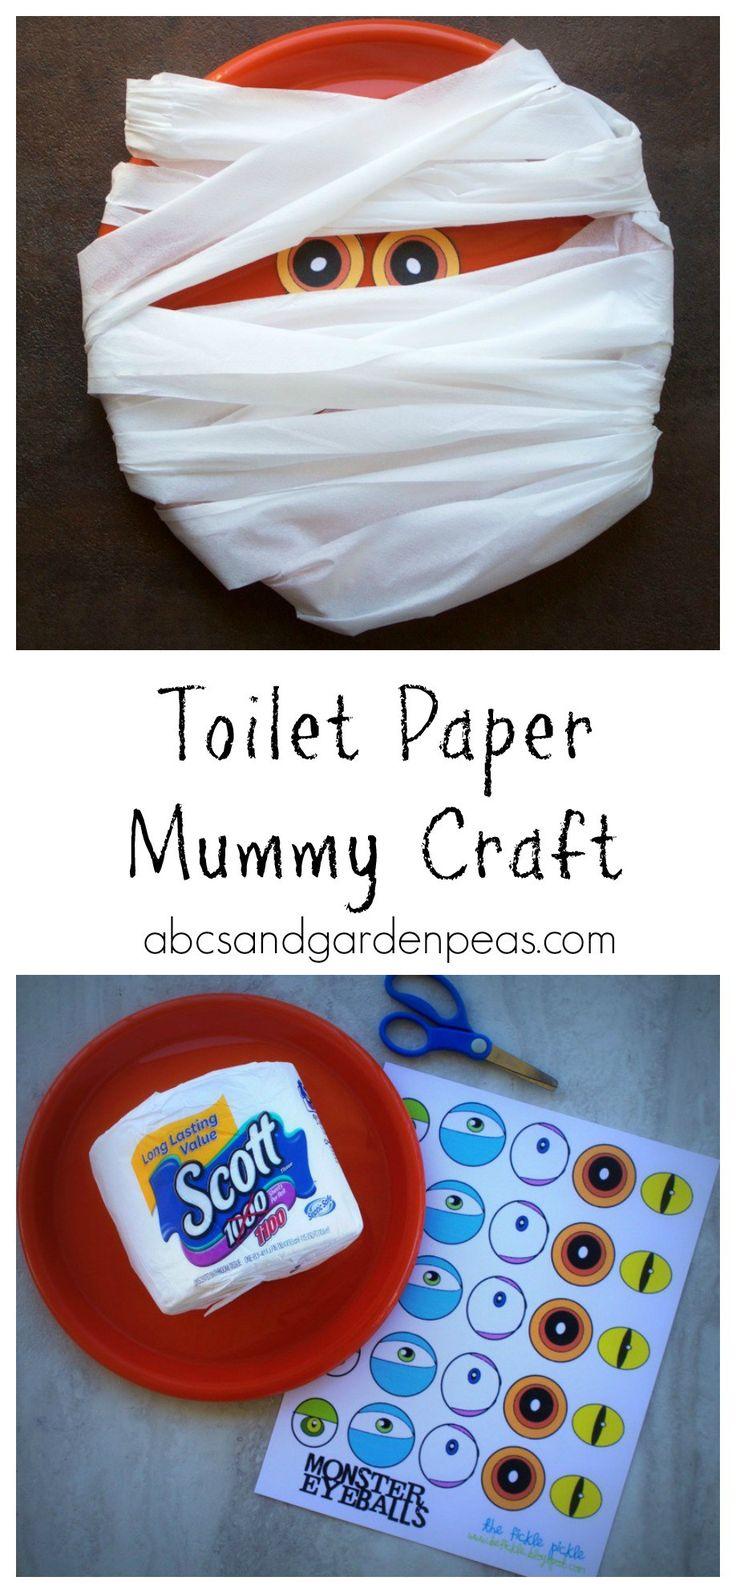 Got Extra? Make Halloween Toilet Paper Crafts!